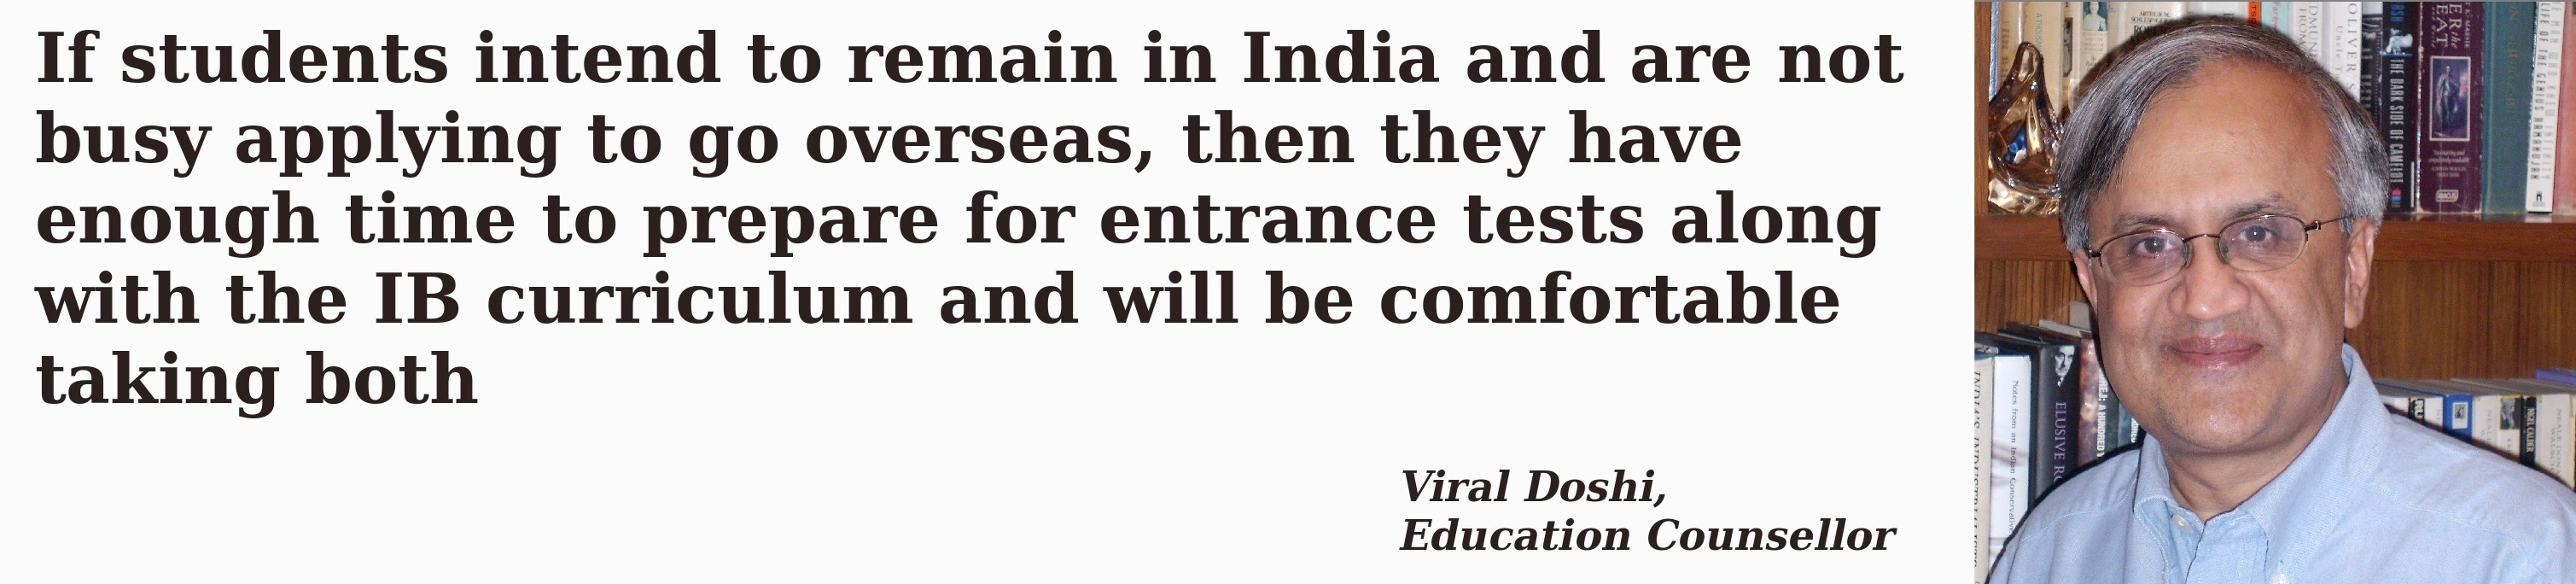 Viral-Doshi